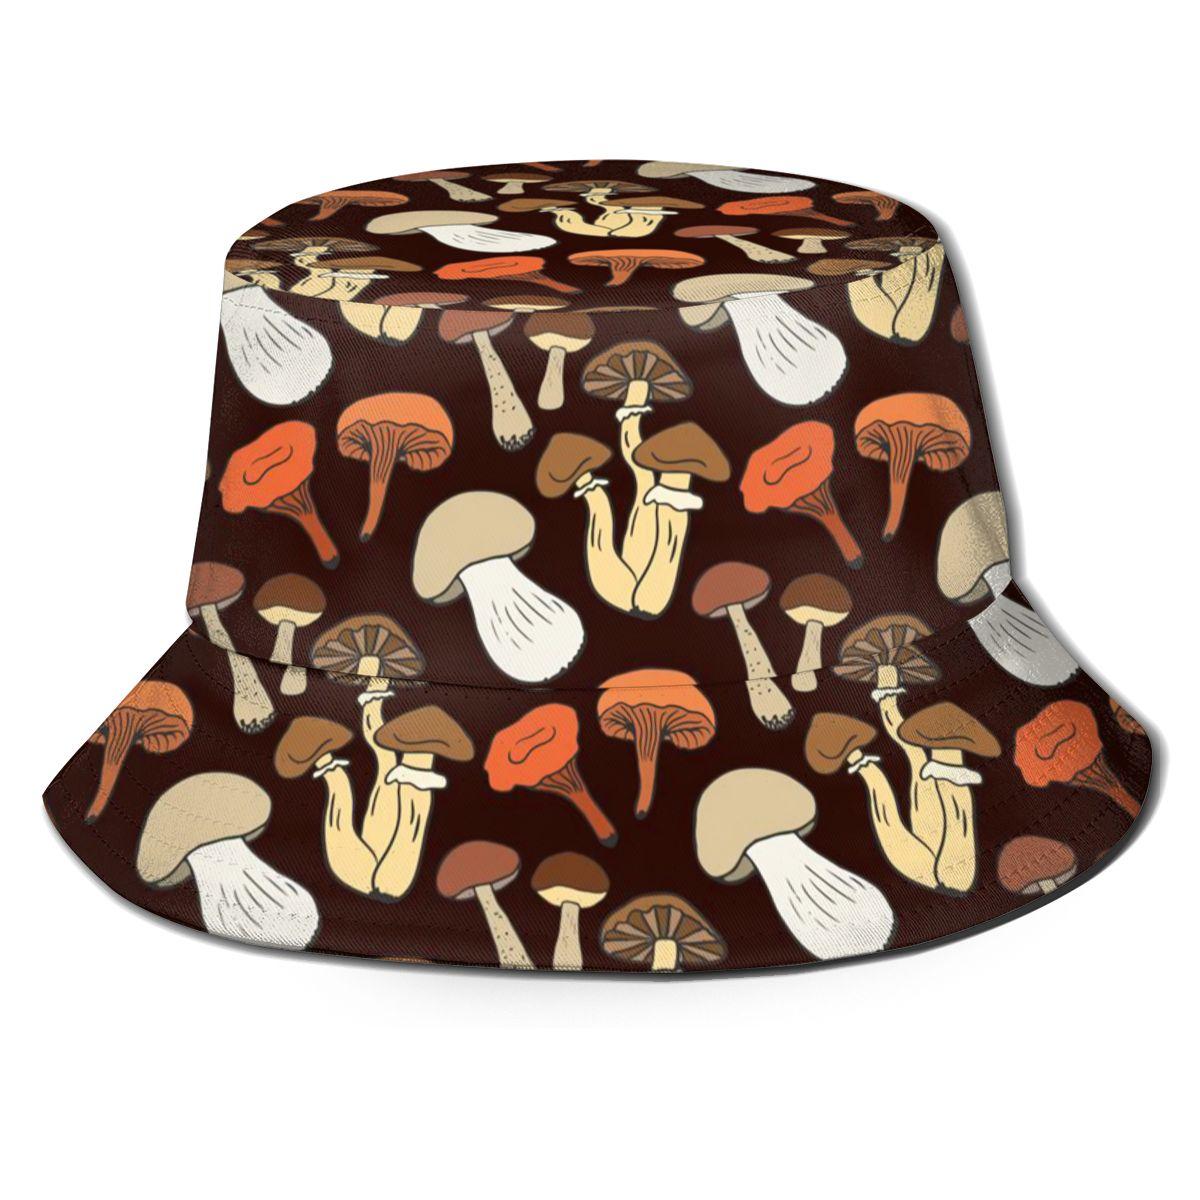 NOISYDESIGNS Mushrooms Printing Hat Women Bucket Cap Design Flat Visor Harajuku Fisherman Hats Dropshipping